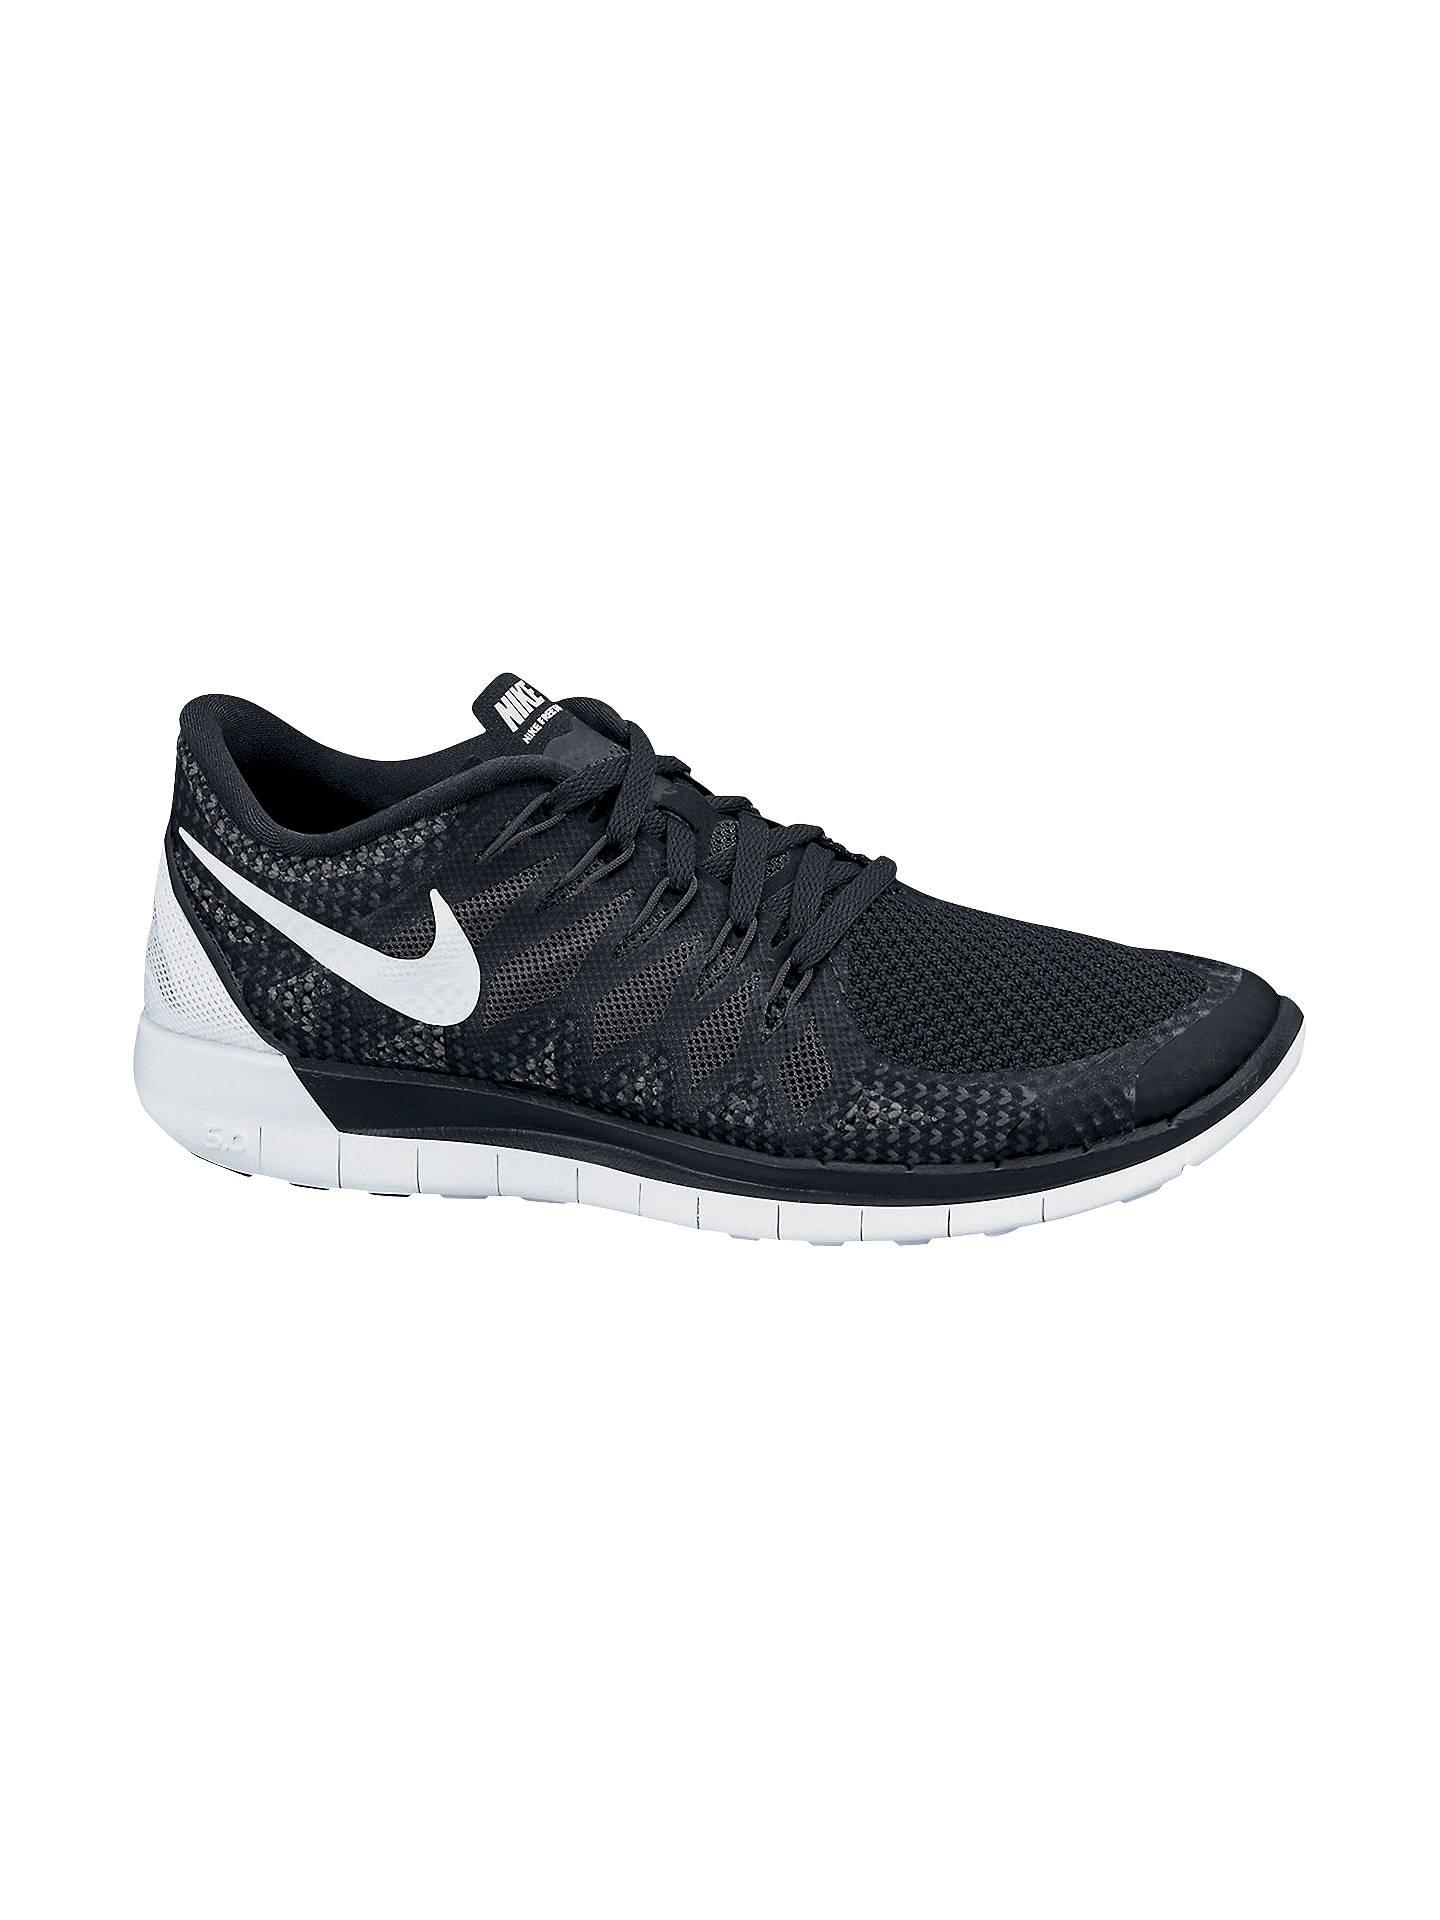 buy online bf0d5 377b5 Nike Free 5.0 Women's Running Shoes at John Lewis & Partners